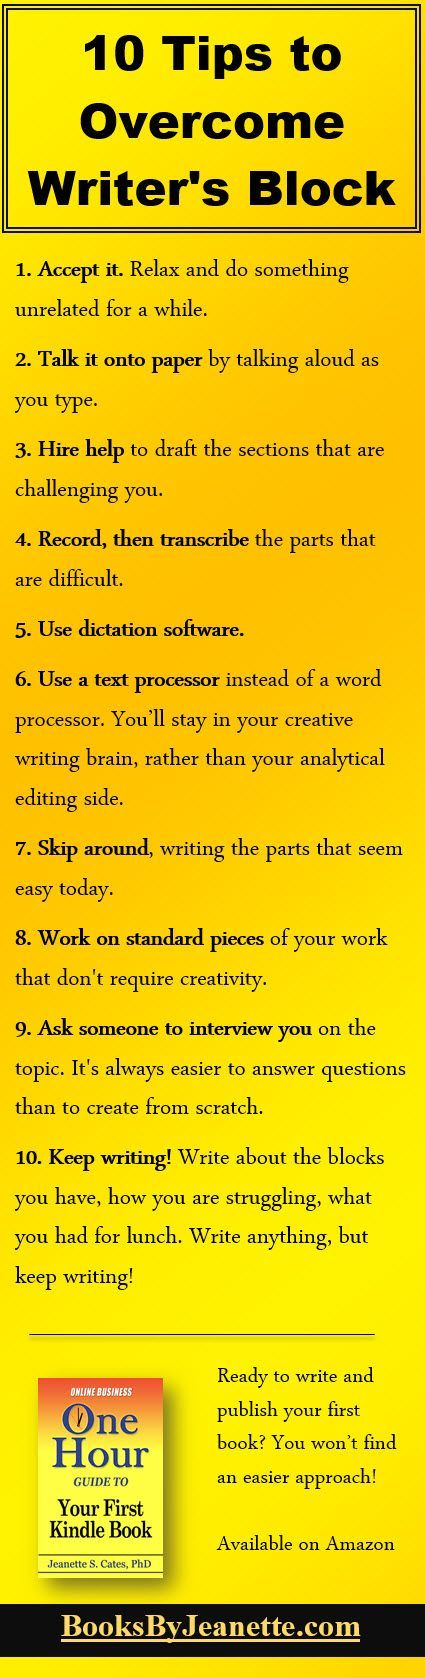 10 Tips to Overcome Writer's Block